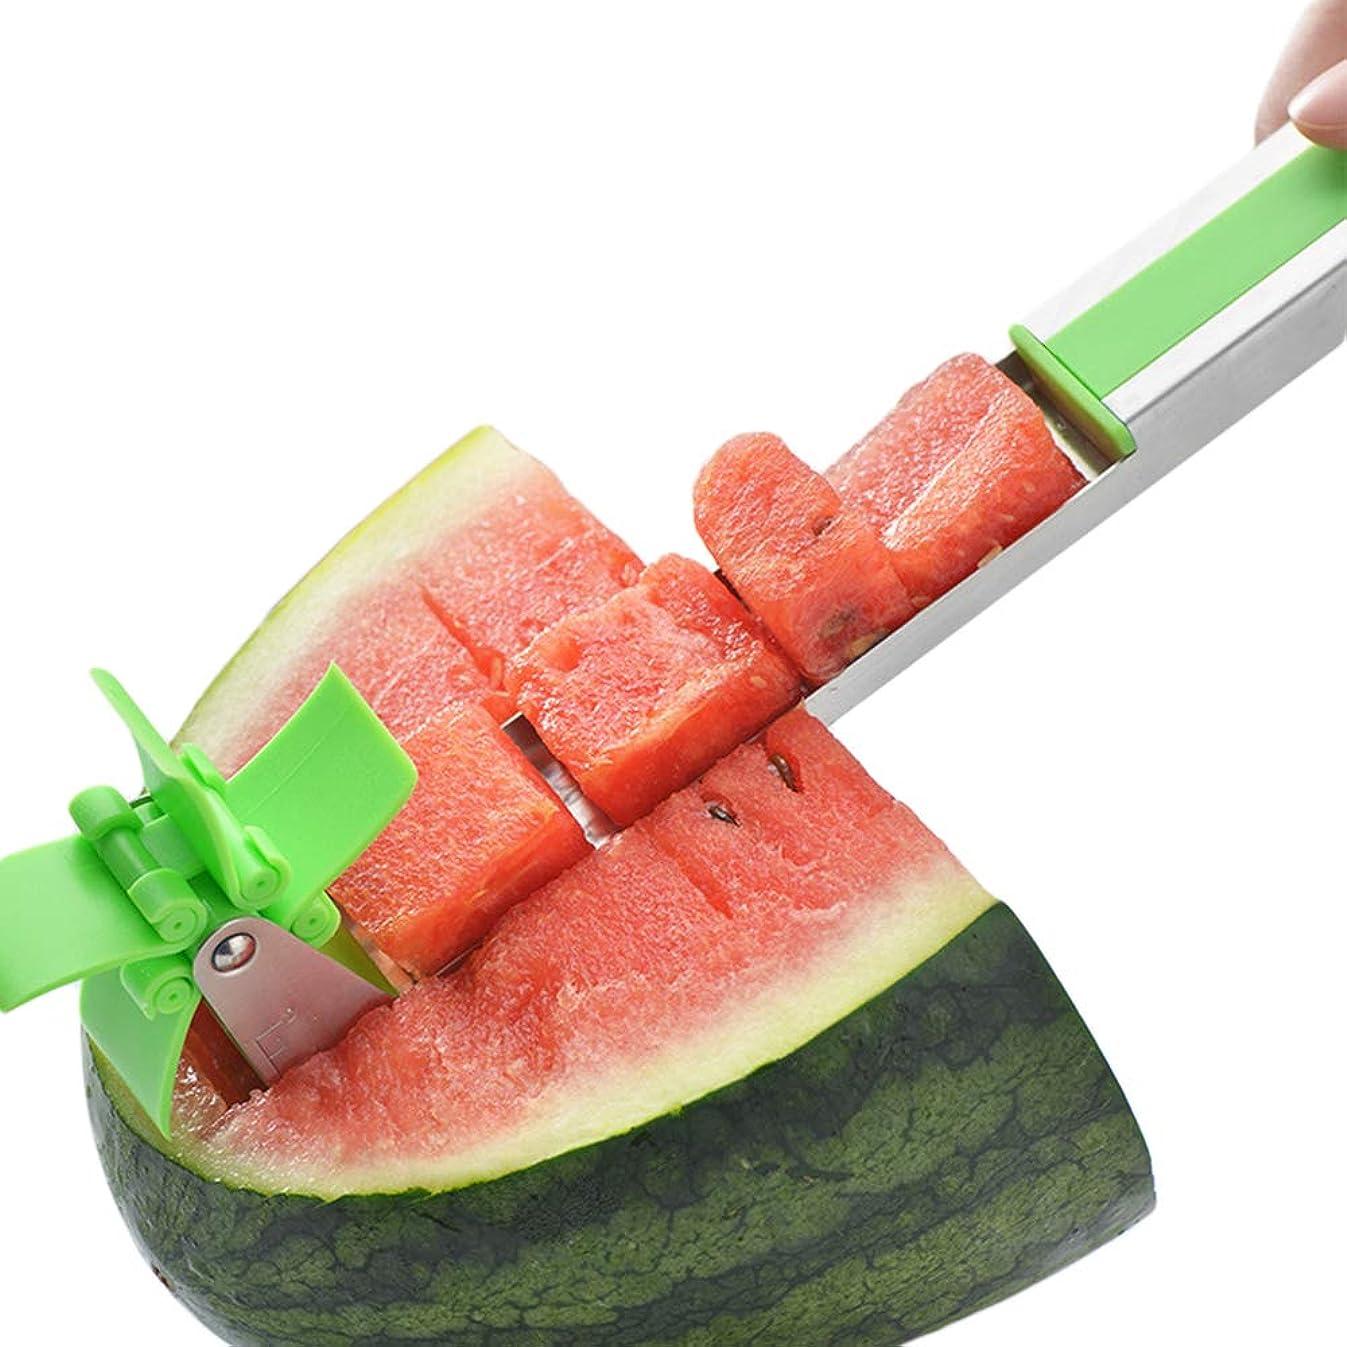 Smart Watermelon Windmill Slicer Creative Stainless Steel Watermelon Windmill Cutter